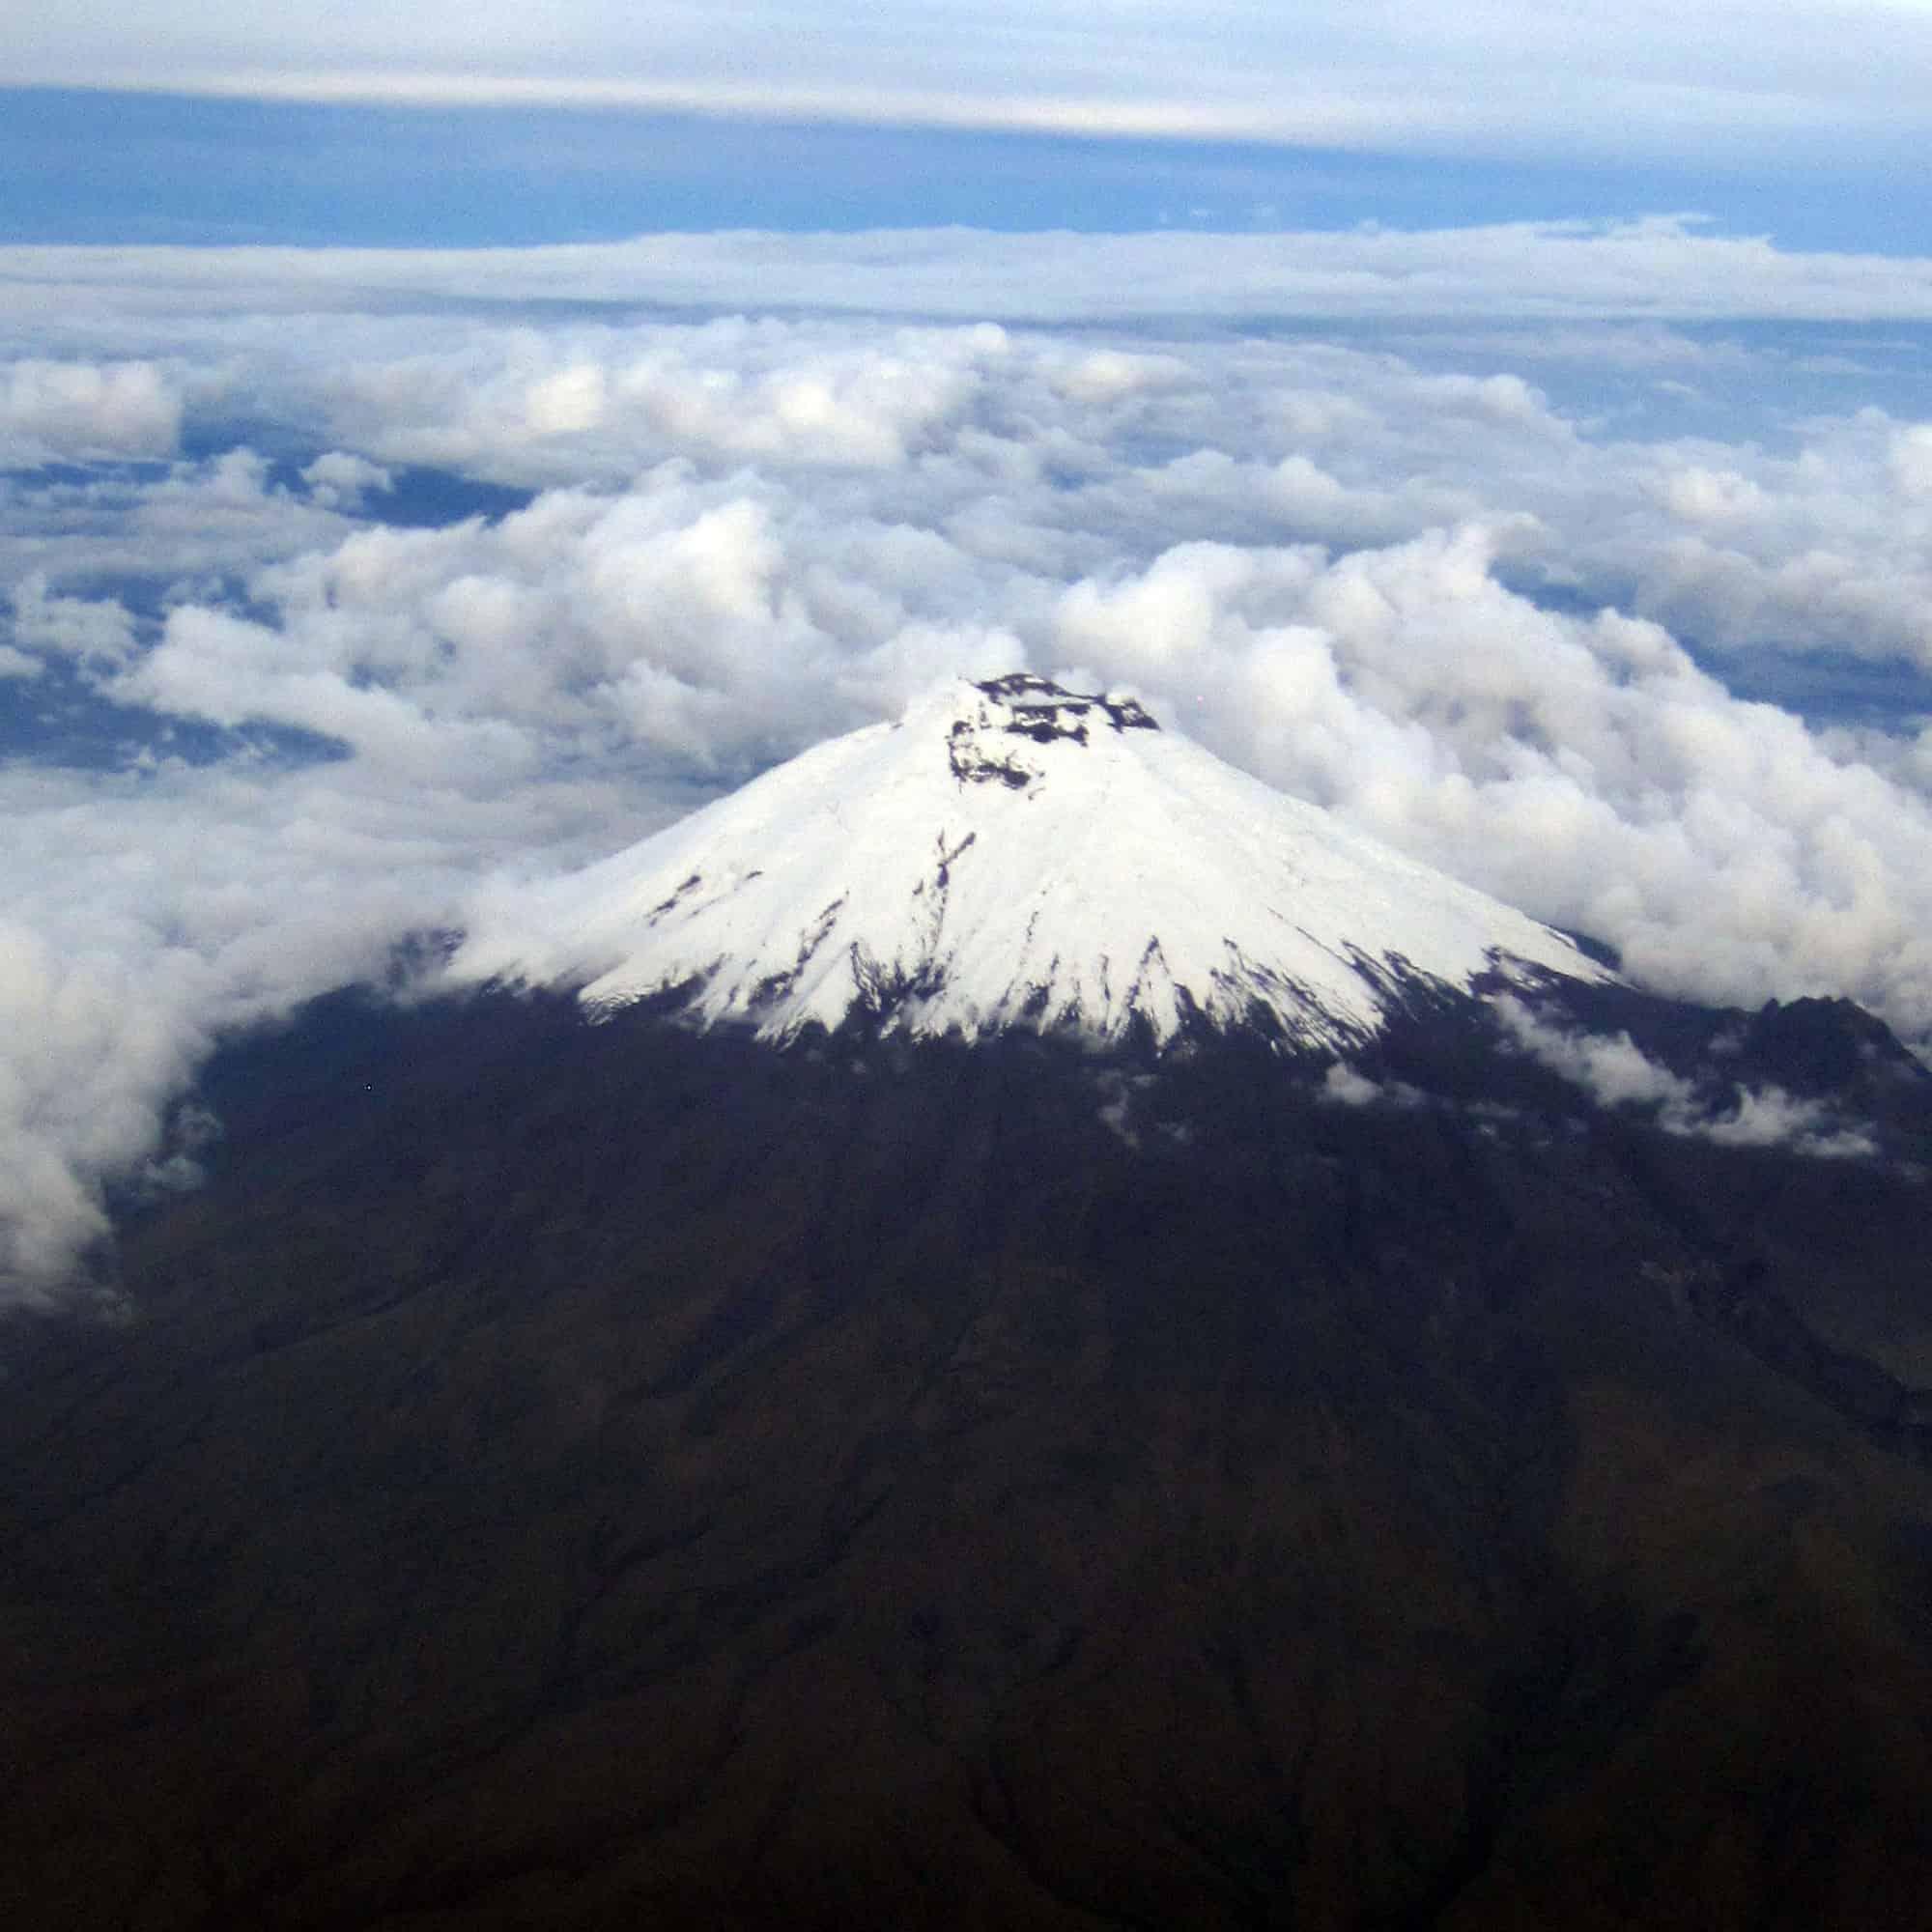 WeeklyPhoto - Cotopaxi Volcano Ecuador By Air